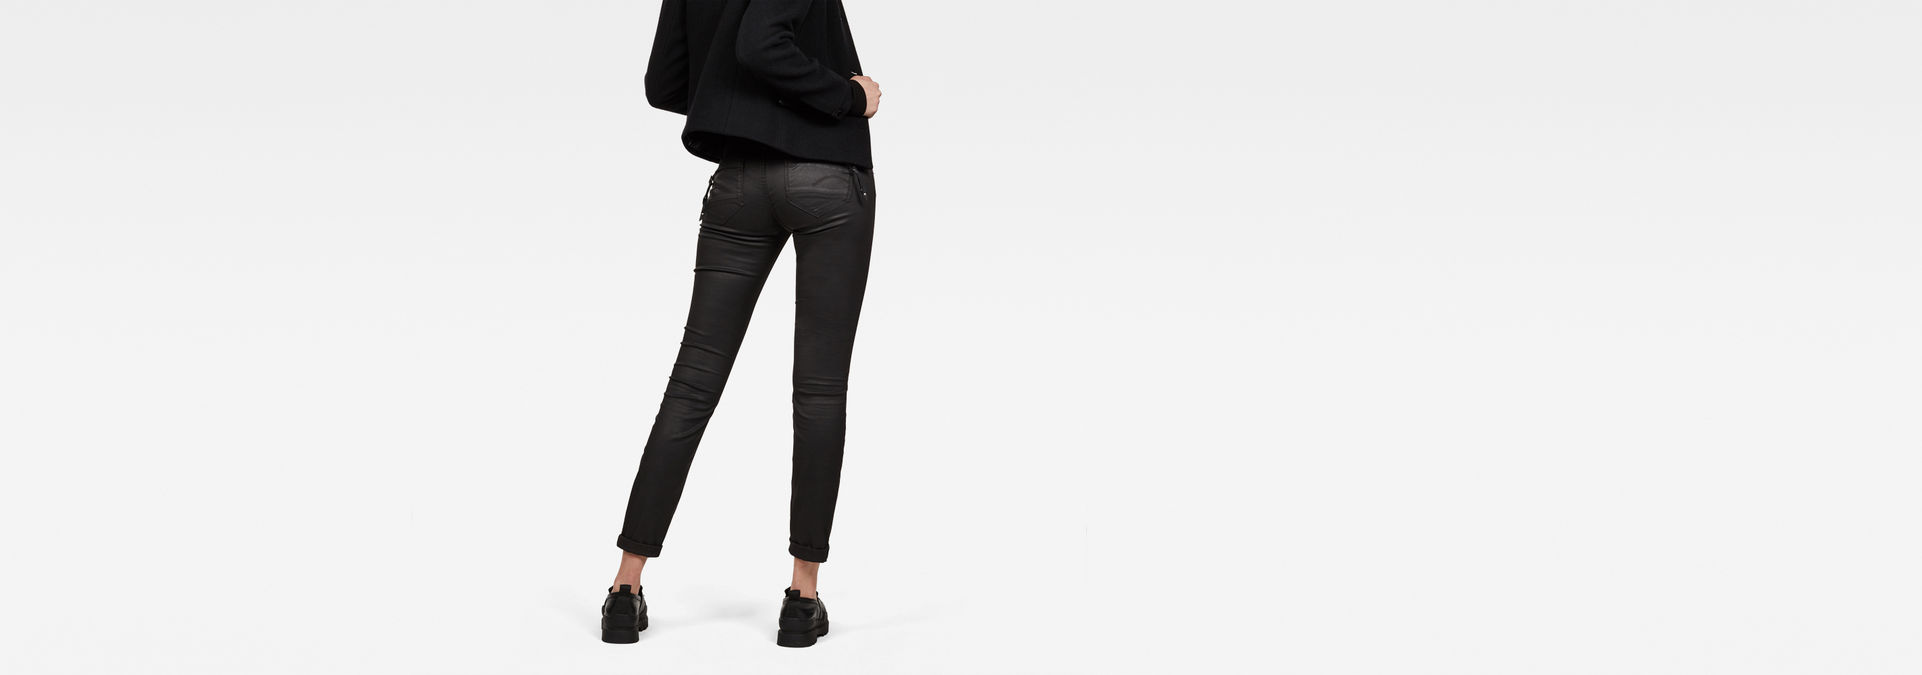 Mujer Pantalones G Star Raw Rovic Mid Waist Skinny Pantalones Para Mujer Pantalones Poliglota Net